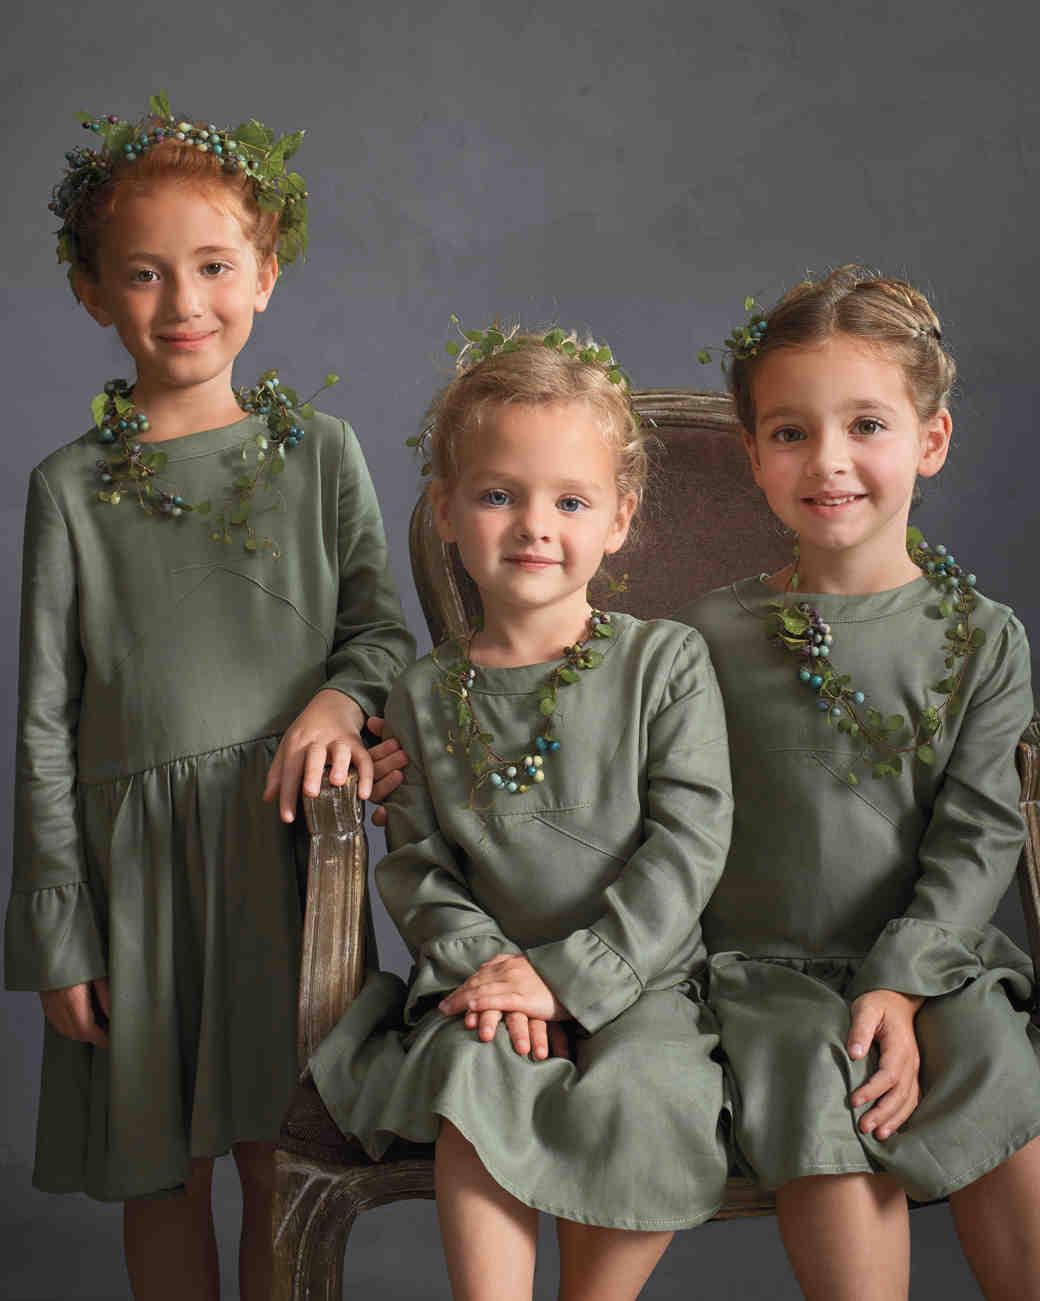 flower-girls-floral-hair-wreaths-586-d111584-comp.jpg